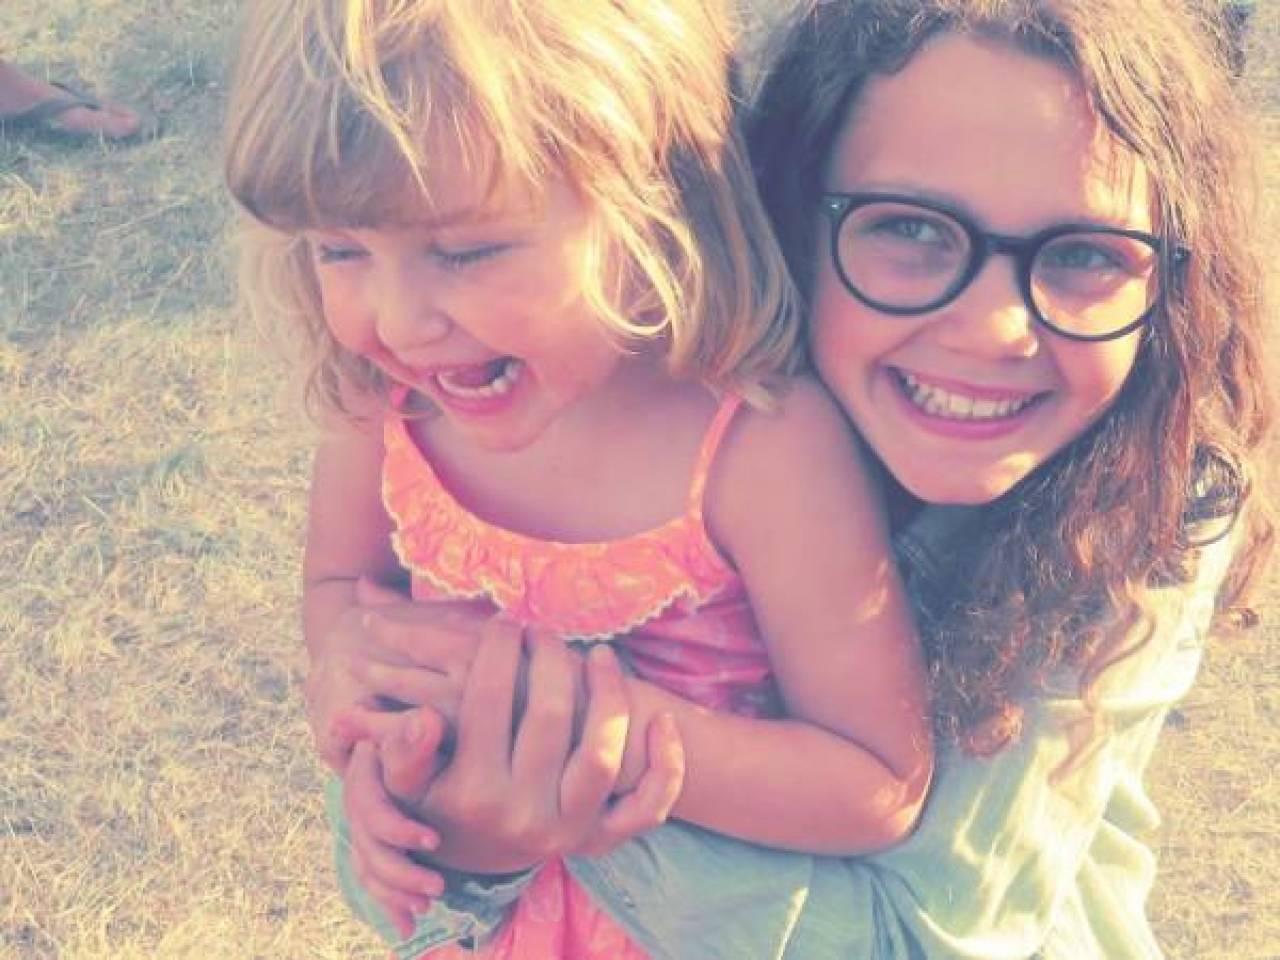 IMG 0260 - Miya wordt alweer 4! | Speelgoed en cadeautips | Ons gezin